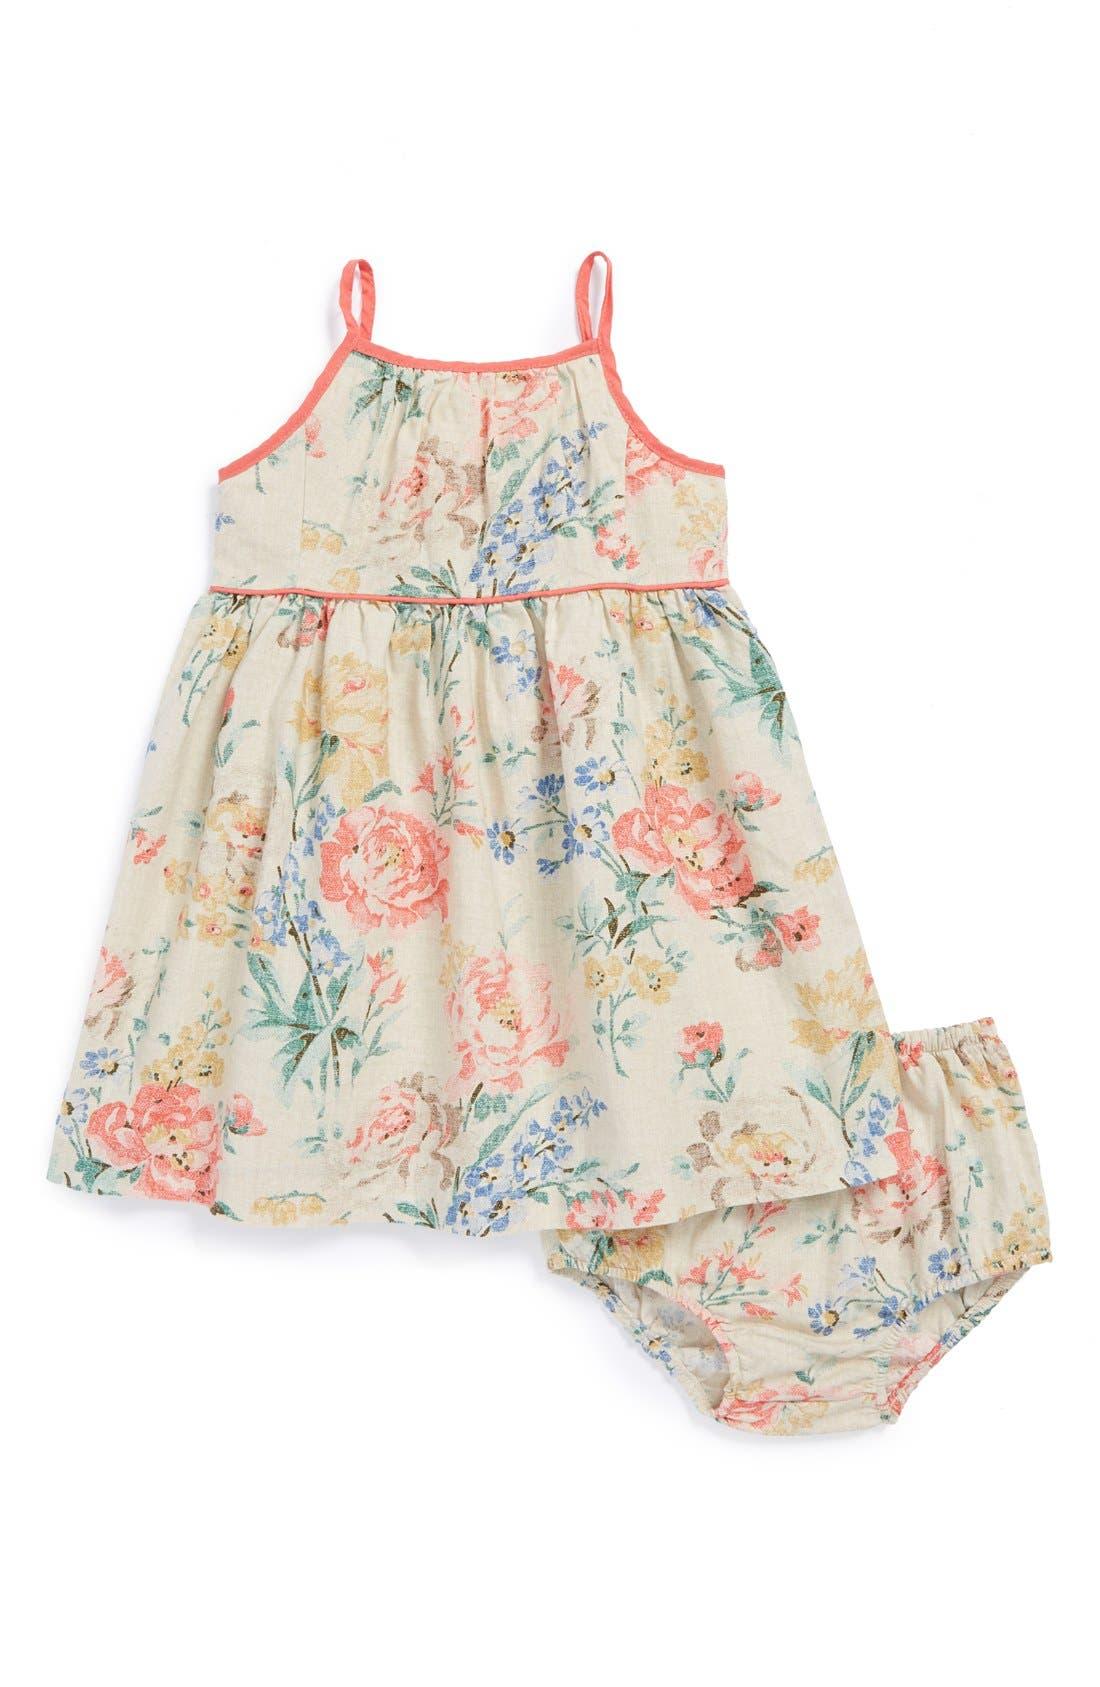 Main Image - Ralph Lauren Floral Print Sleeveless Dress & Bloomers (Baby Girls)